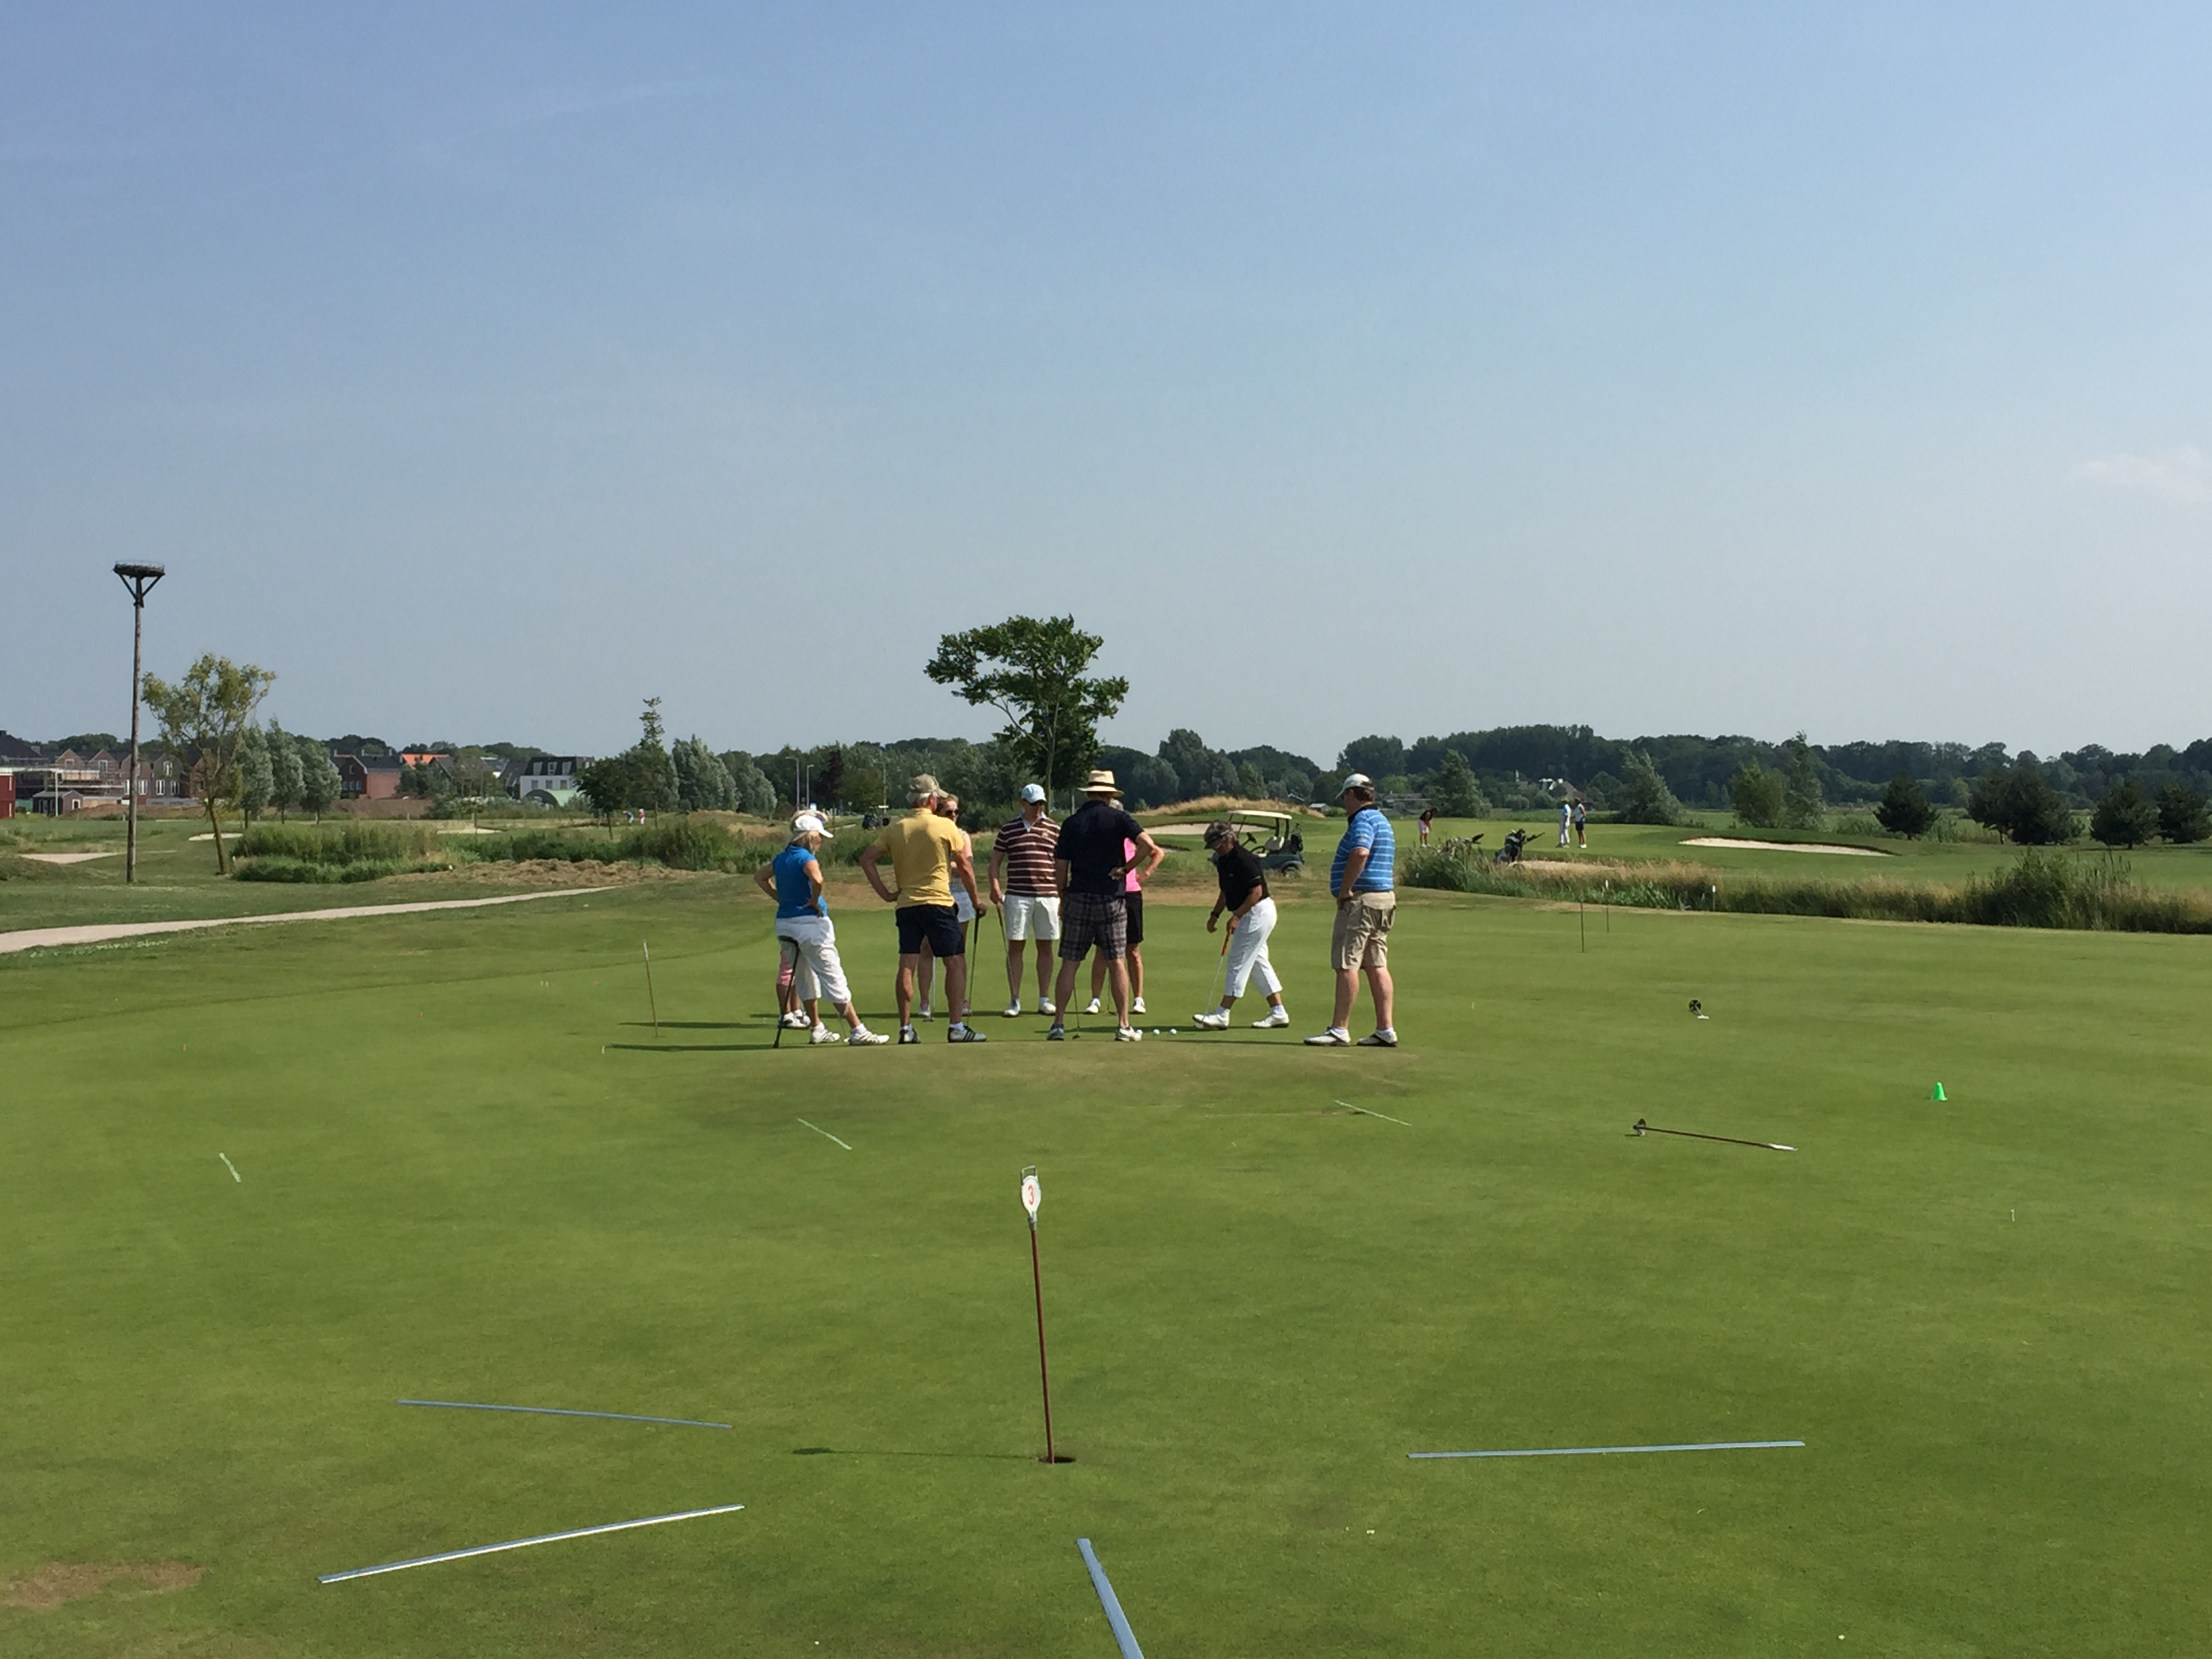 Clinic impressie @ Old Course Loenen onder leiding van Mette Hageman Golf Academy